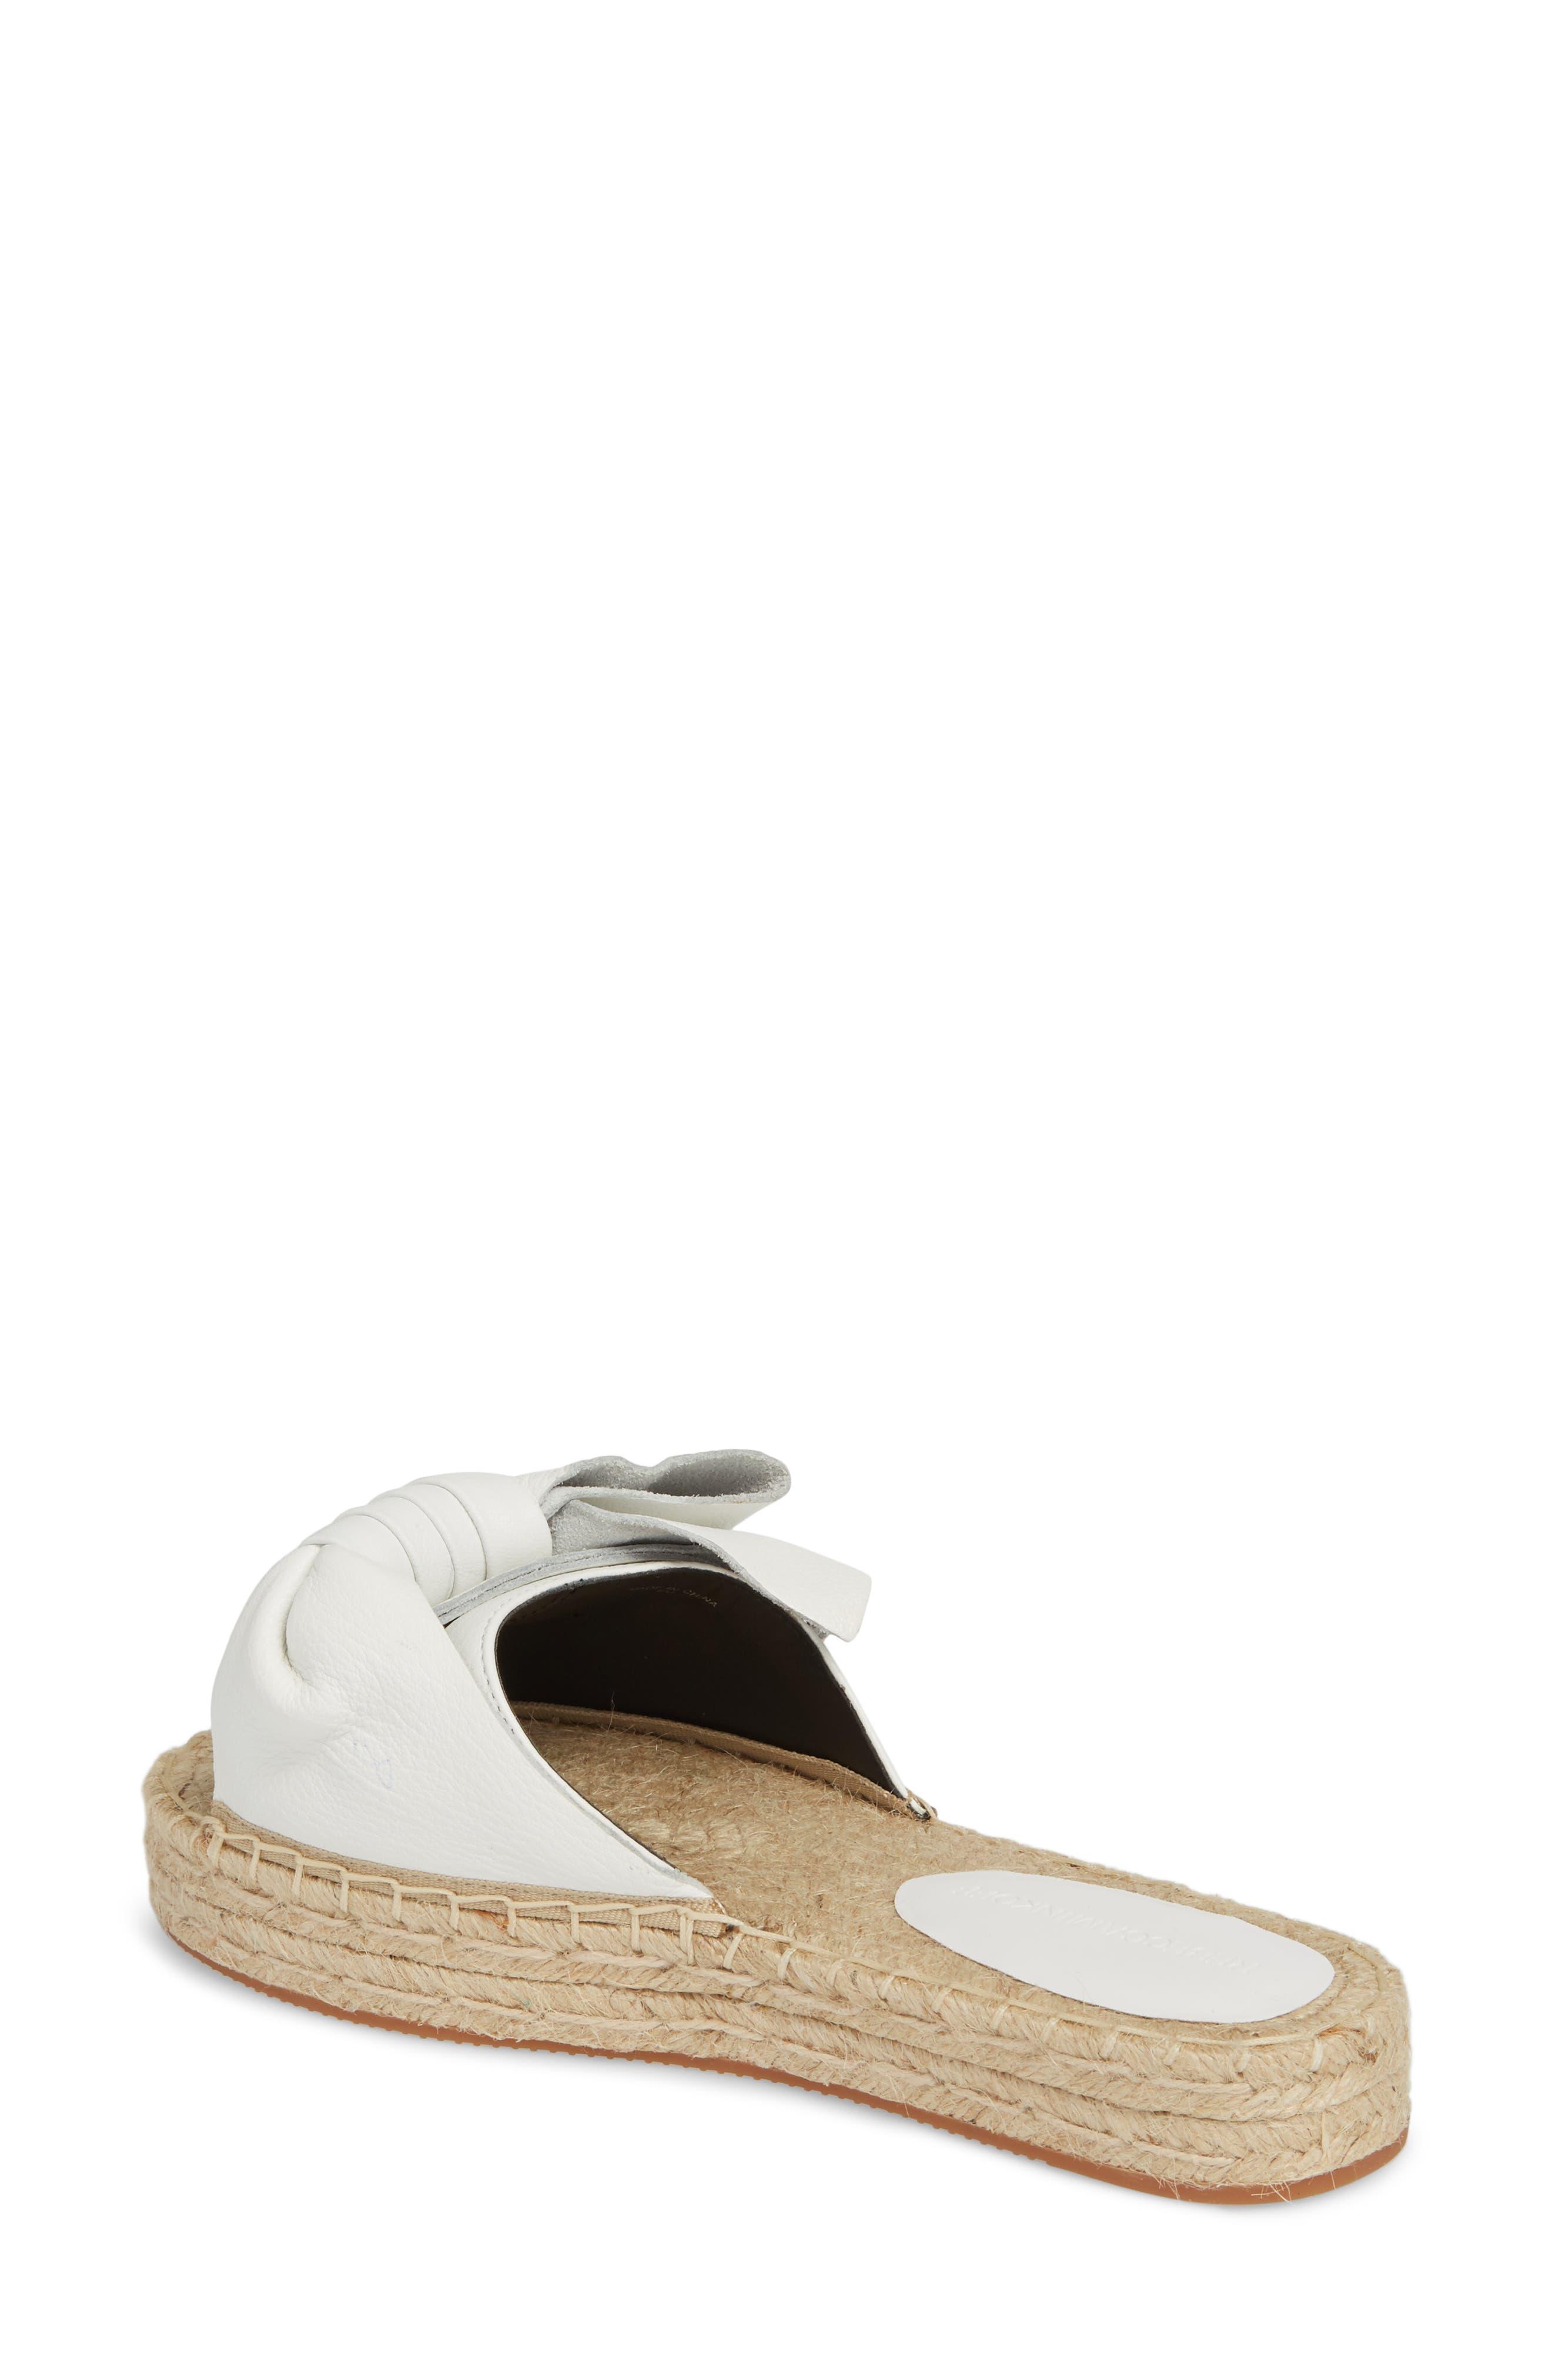 Giana Bow Slide Sandal,                             Alternate thumbnail 2, color,                             Optic White Leather